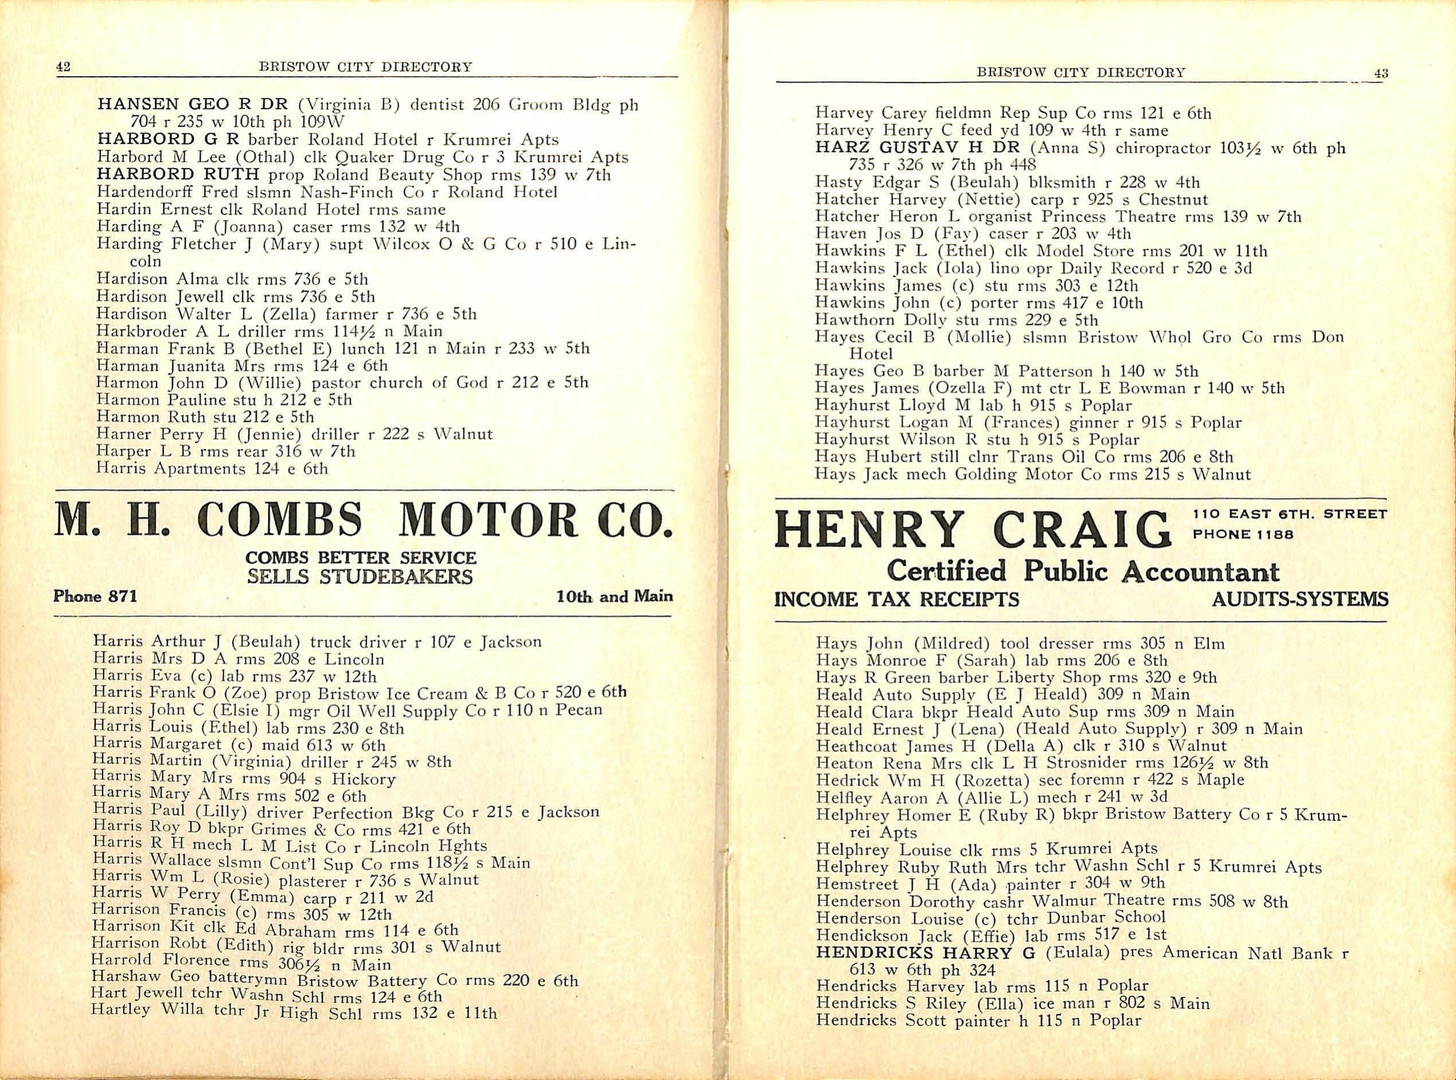 Bristow City Directory 1926_023.jpg